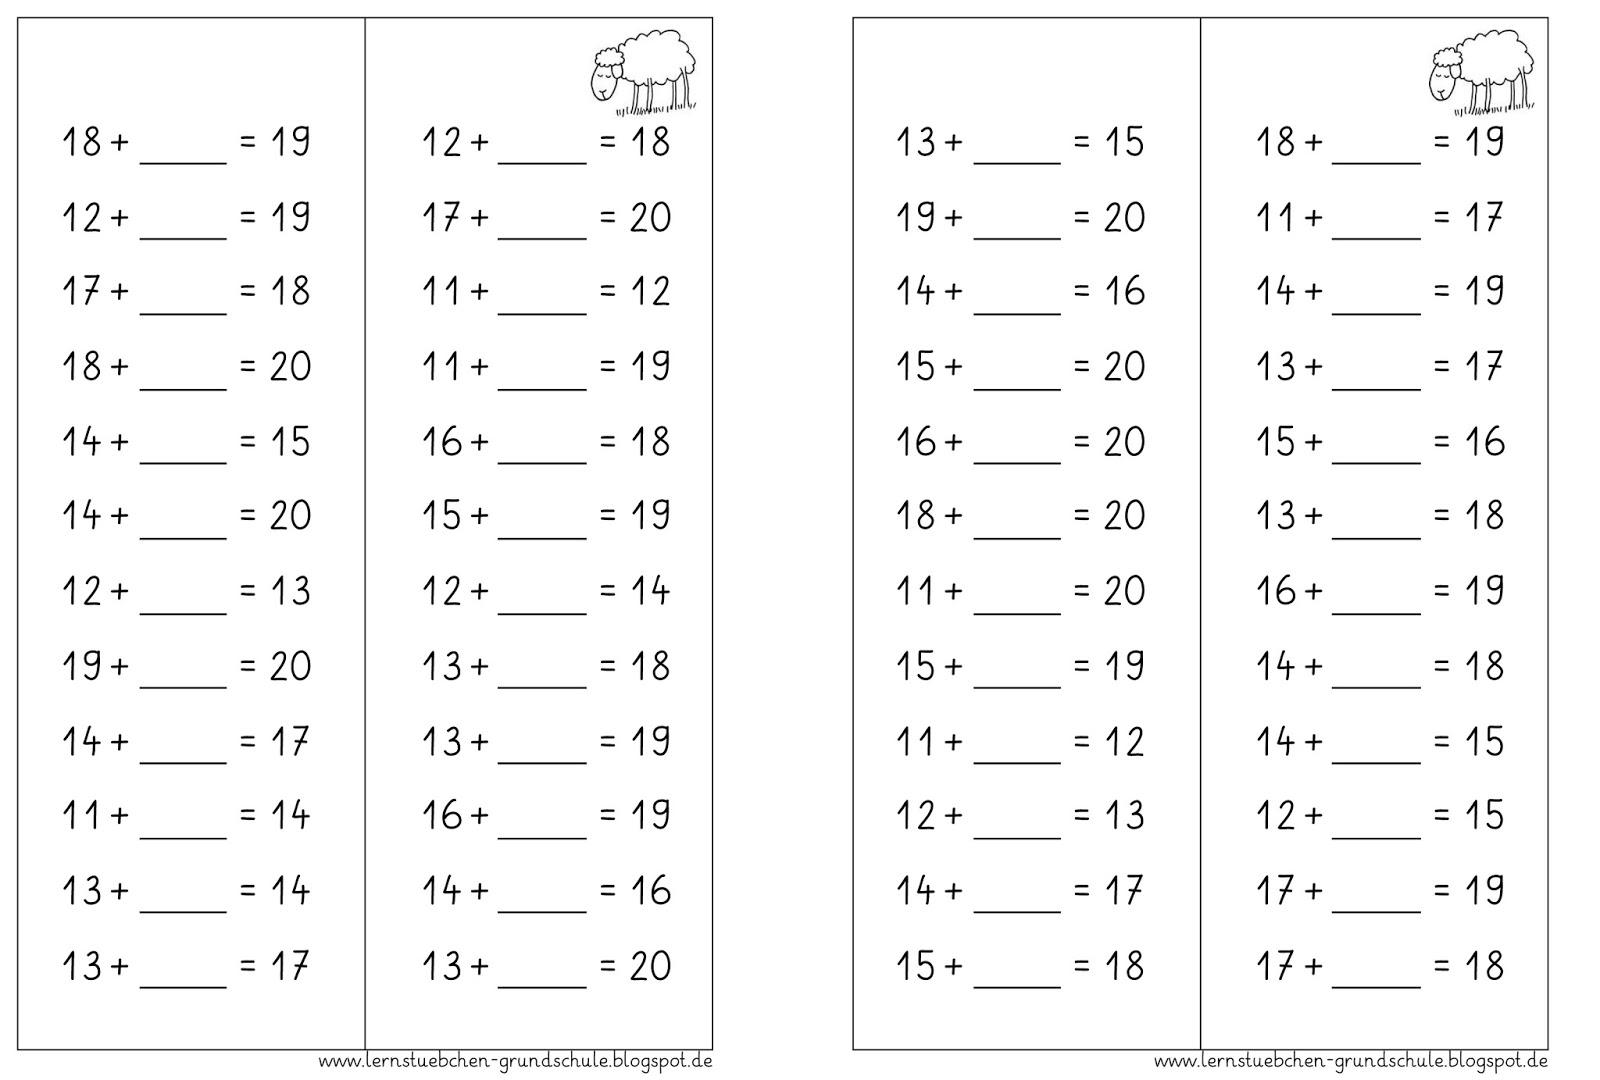 denksportaufgaben mathematik